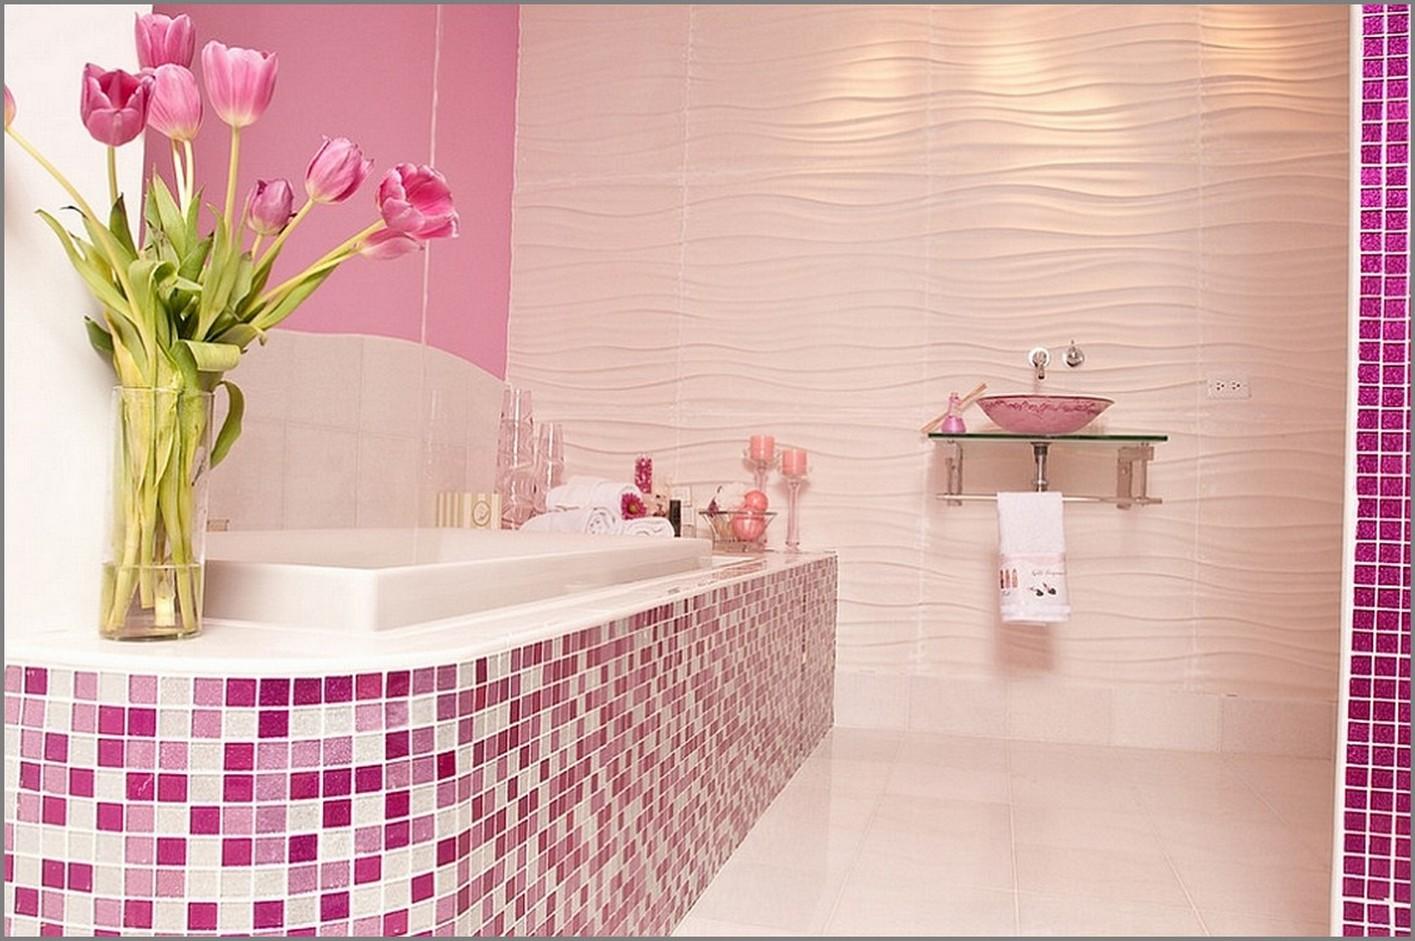 Дизайн раскладки плитки в ванной и туалете